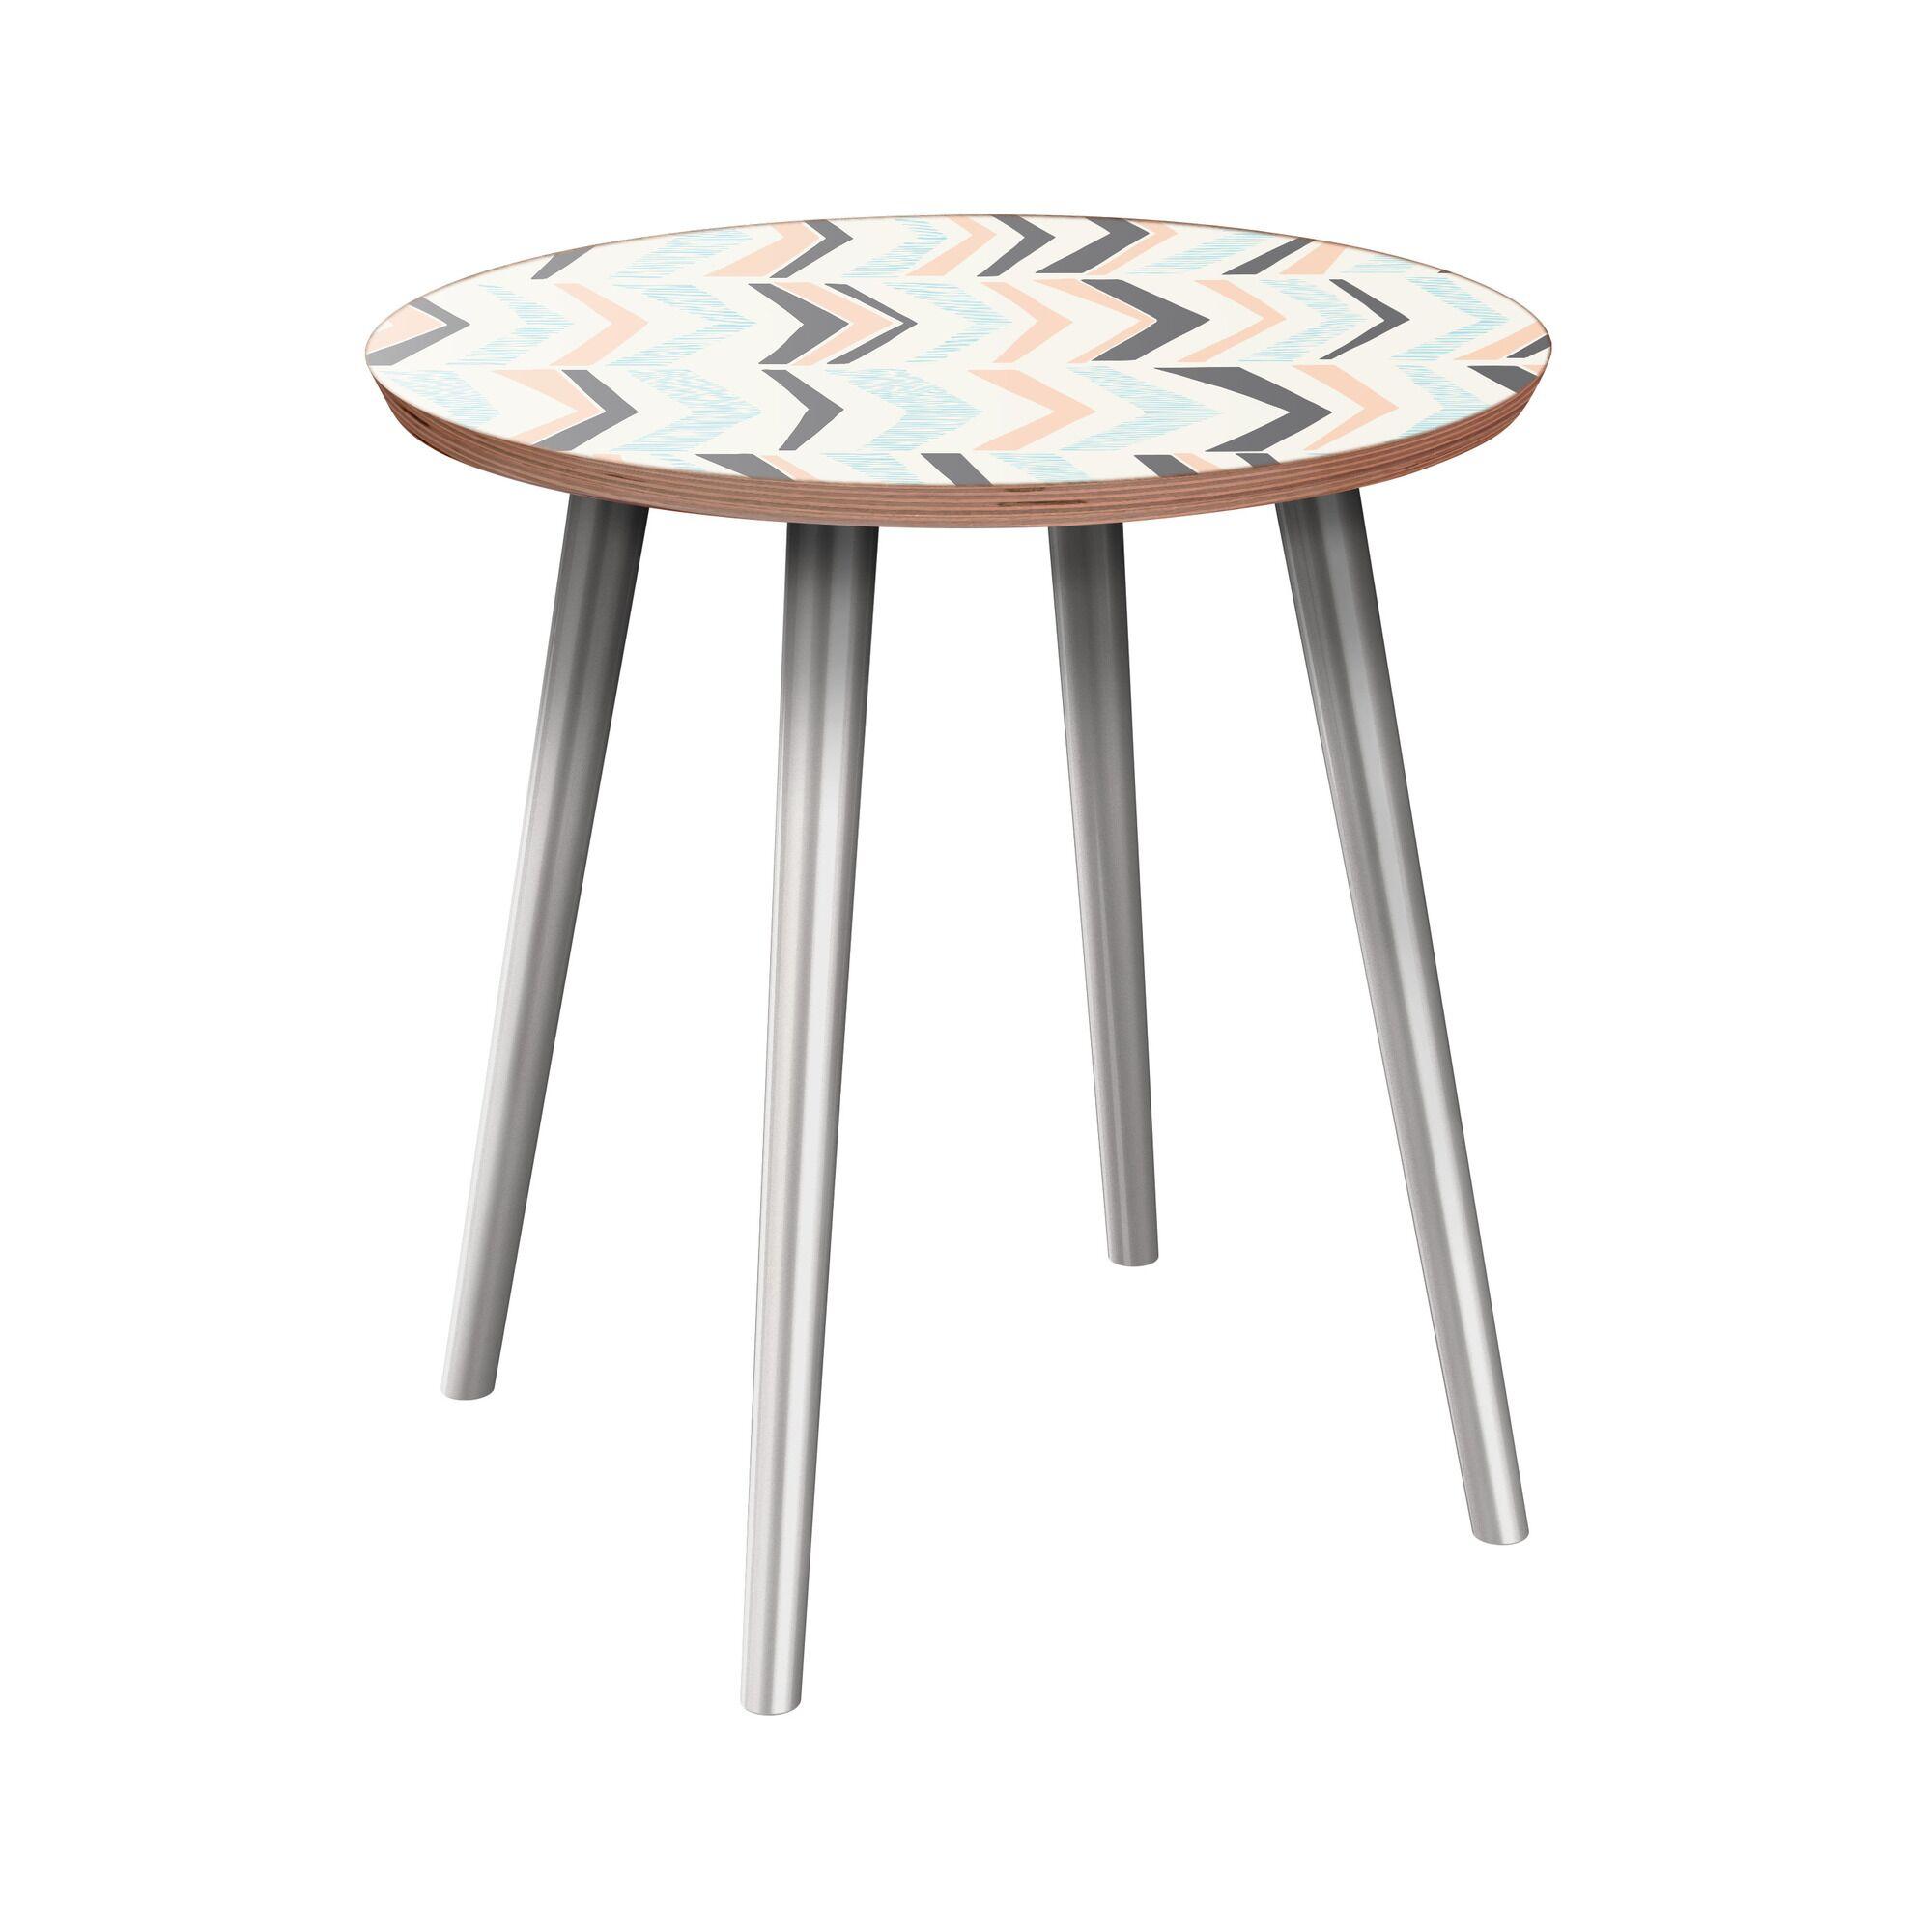 Jazmyn End Table Table Base Color: Chrome, Table Top Color: Walnut